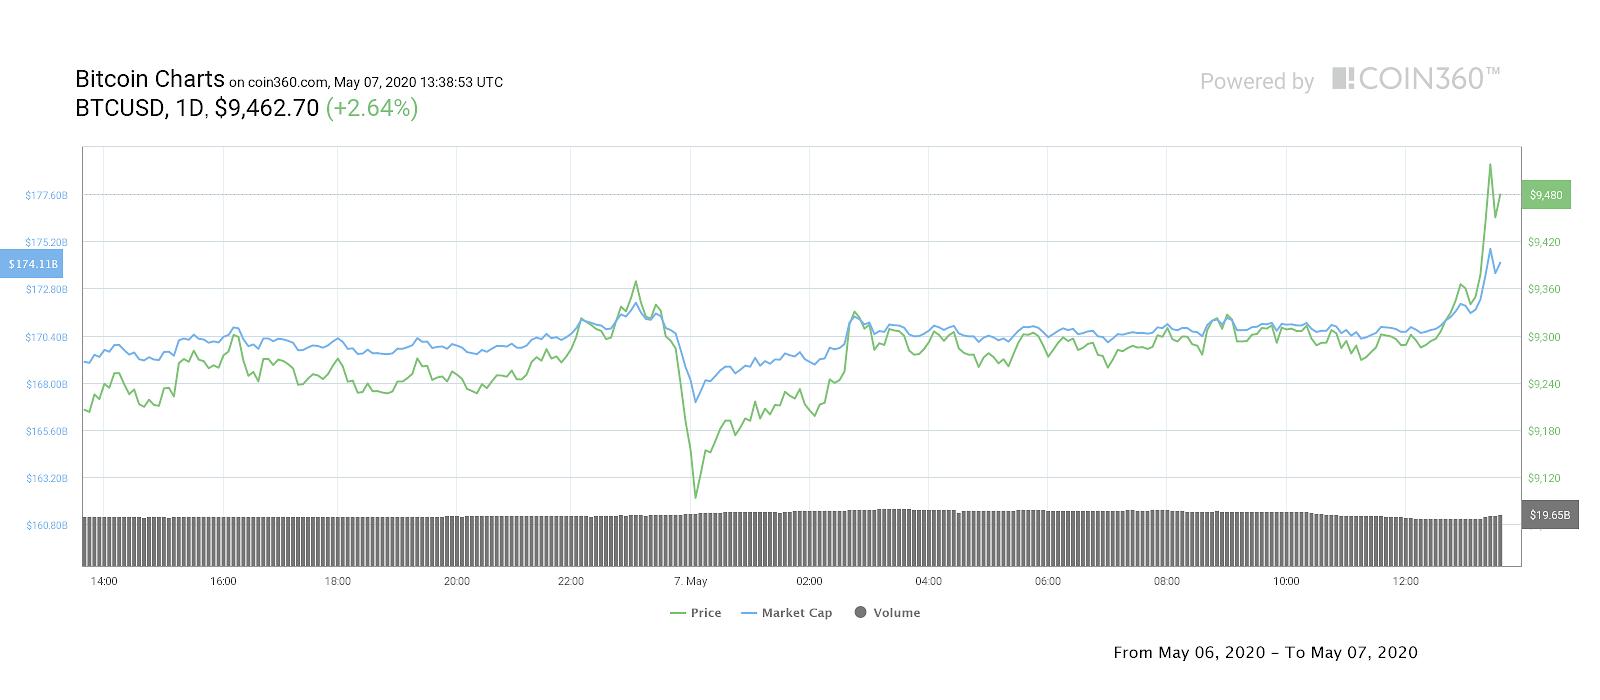 Bitcoin พุ่งแรง ราคาทะลุแนวต้าน $9,600 มุ่งสู่ $10,000 ต่อไป?